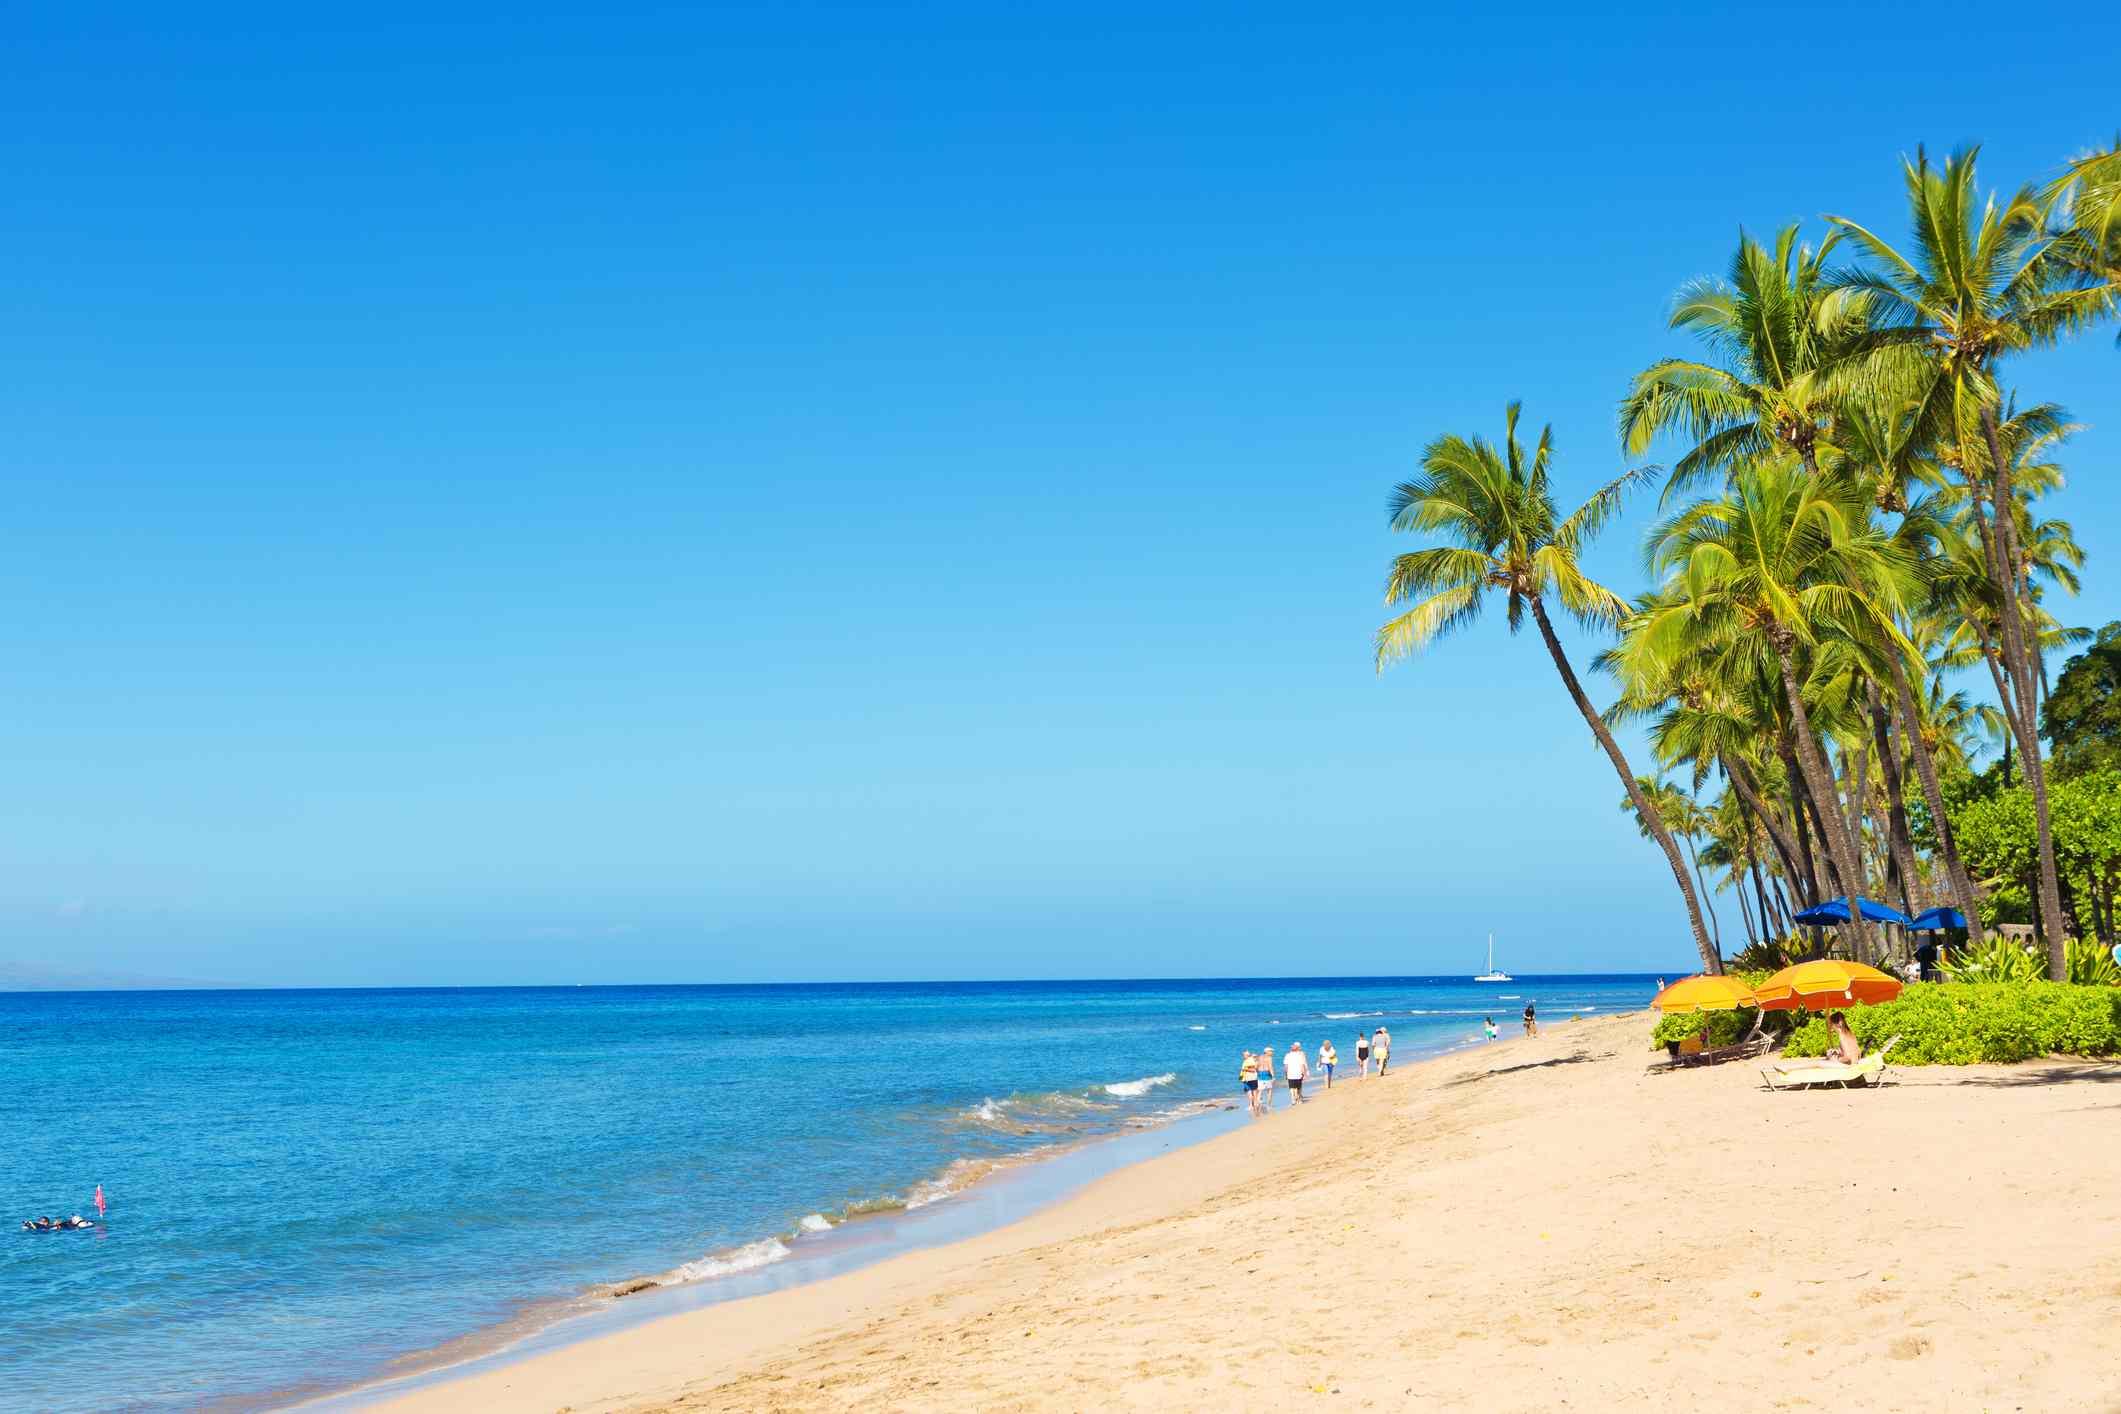 Kaanapali Beach and resort Hotels on Maui Hawaii